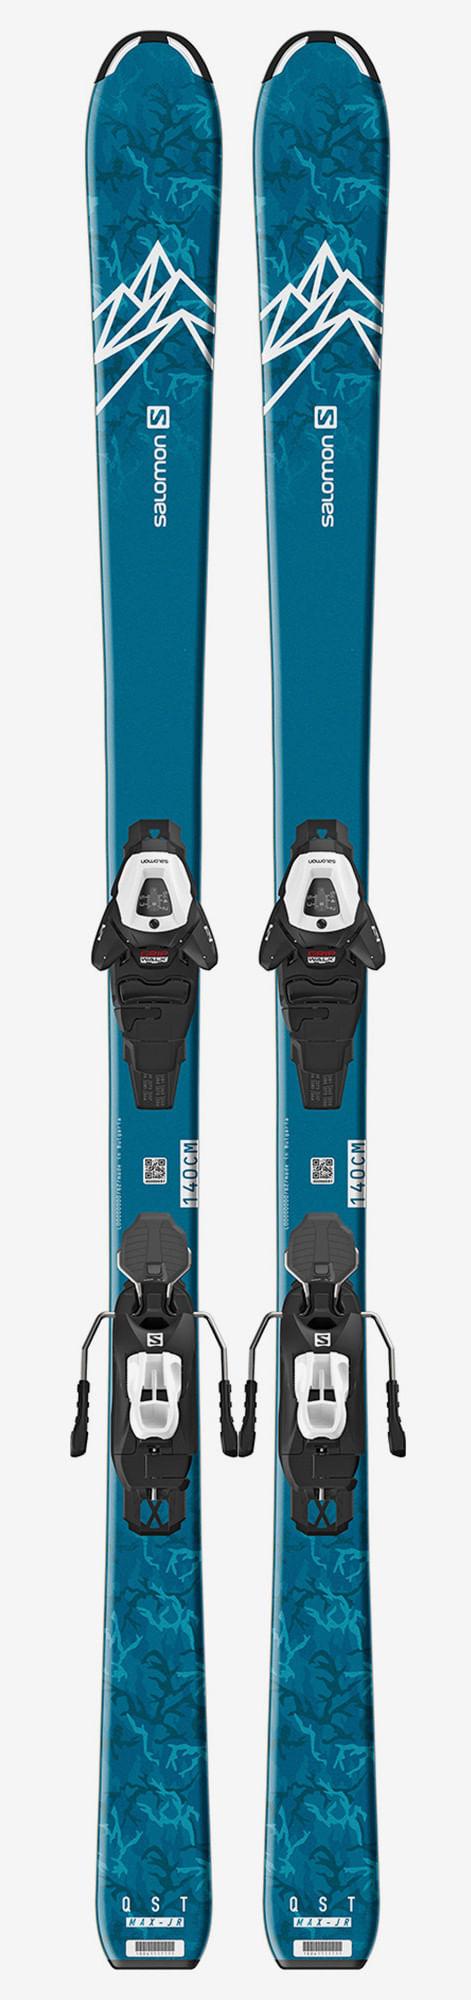 2021 Salomon QST MAX Jr M + L6 GW   Skis - ERIK'S